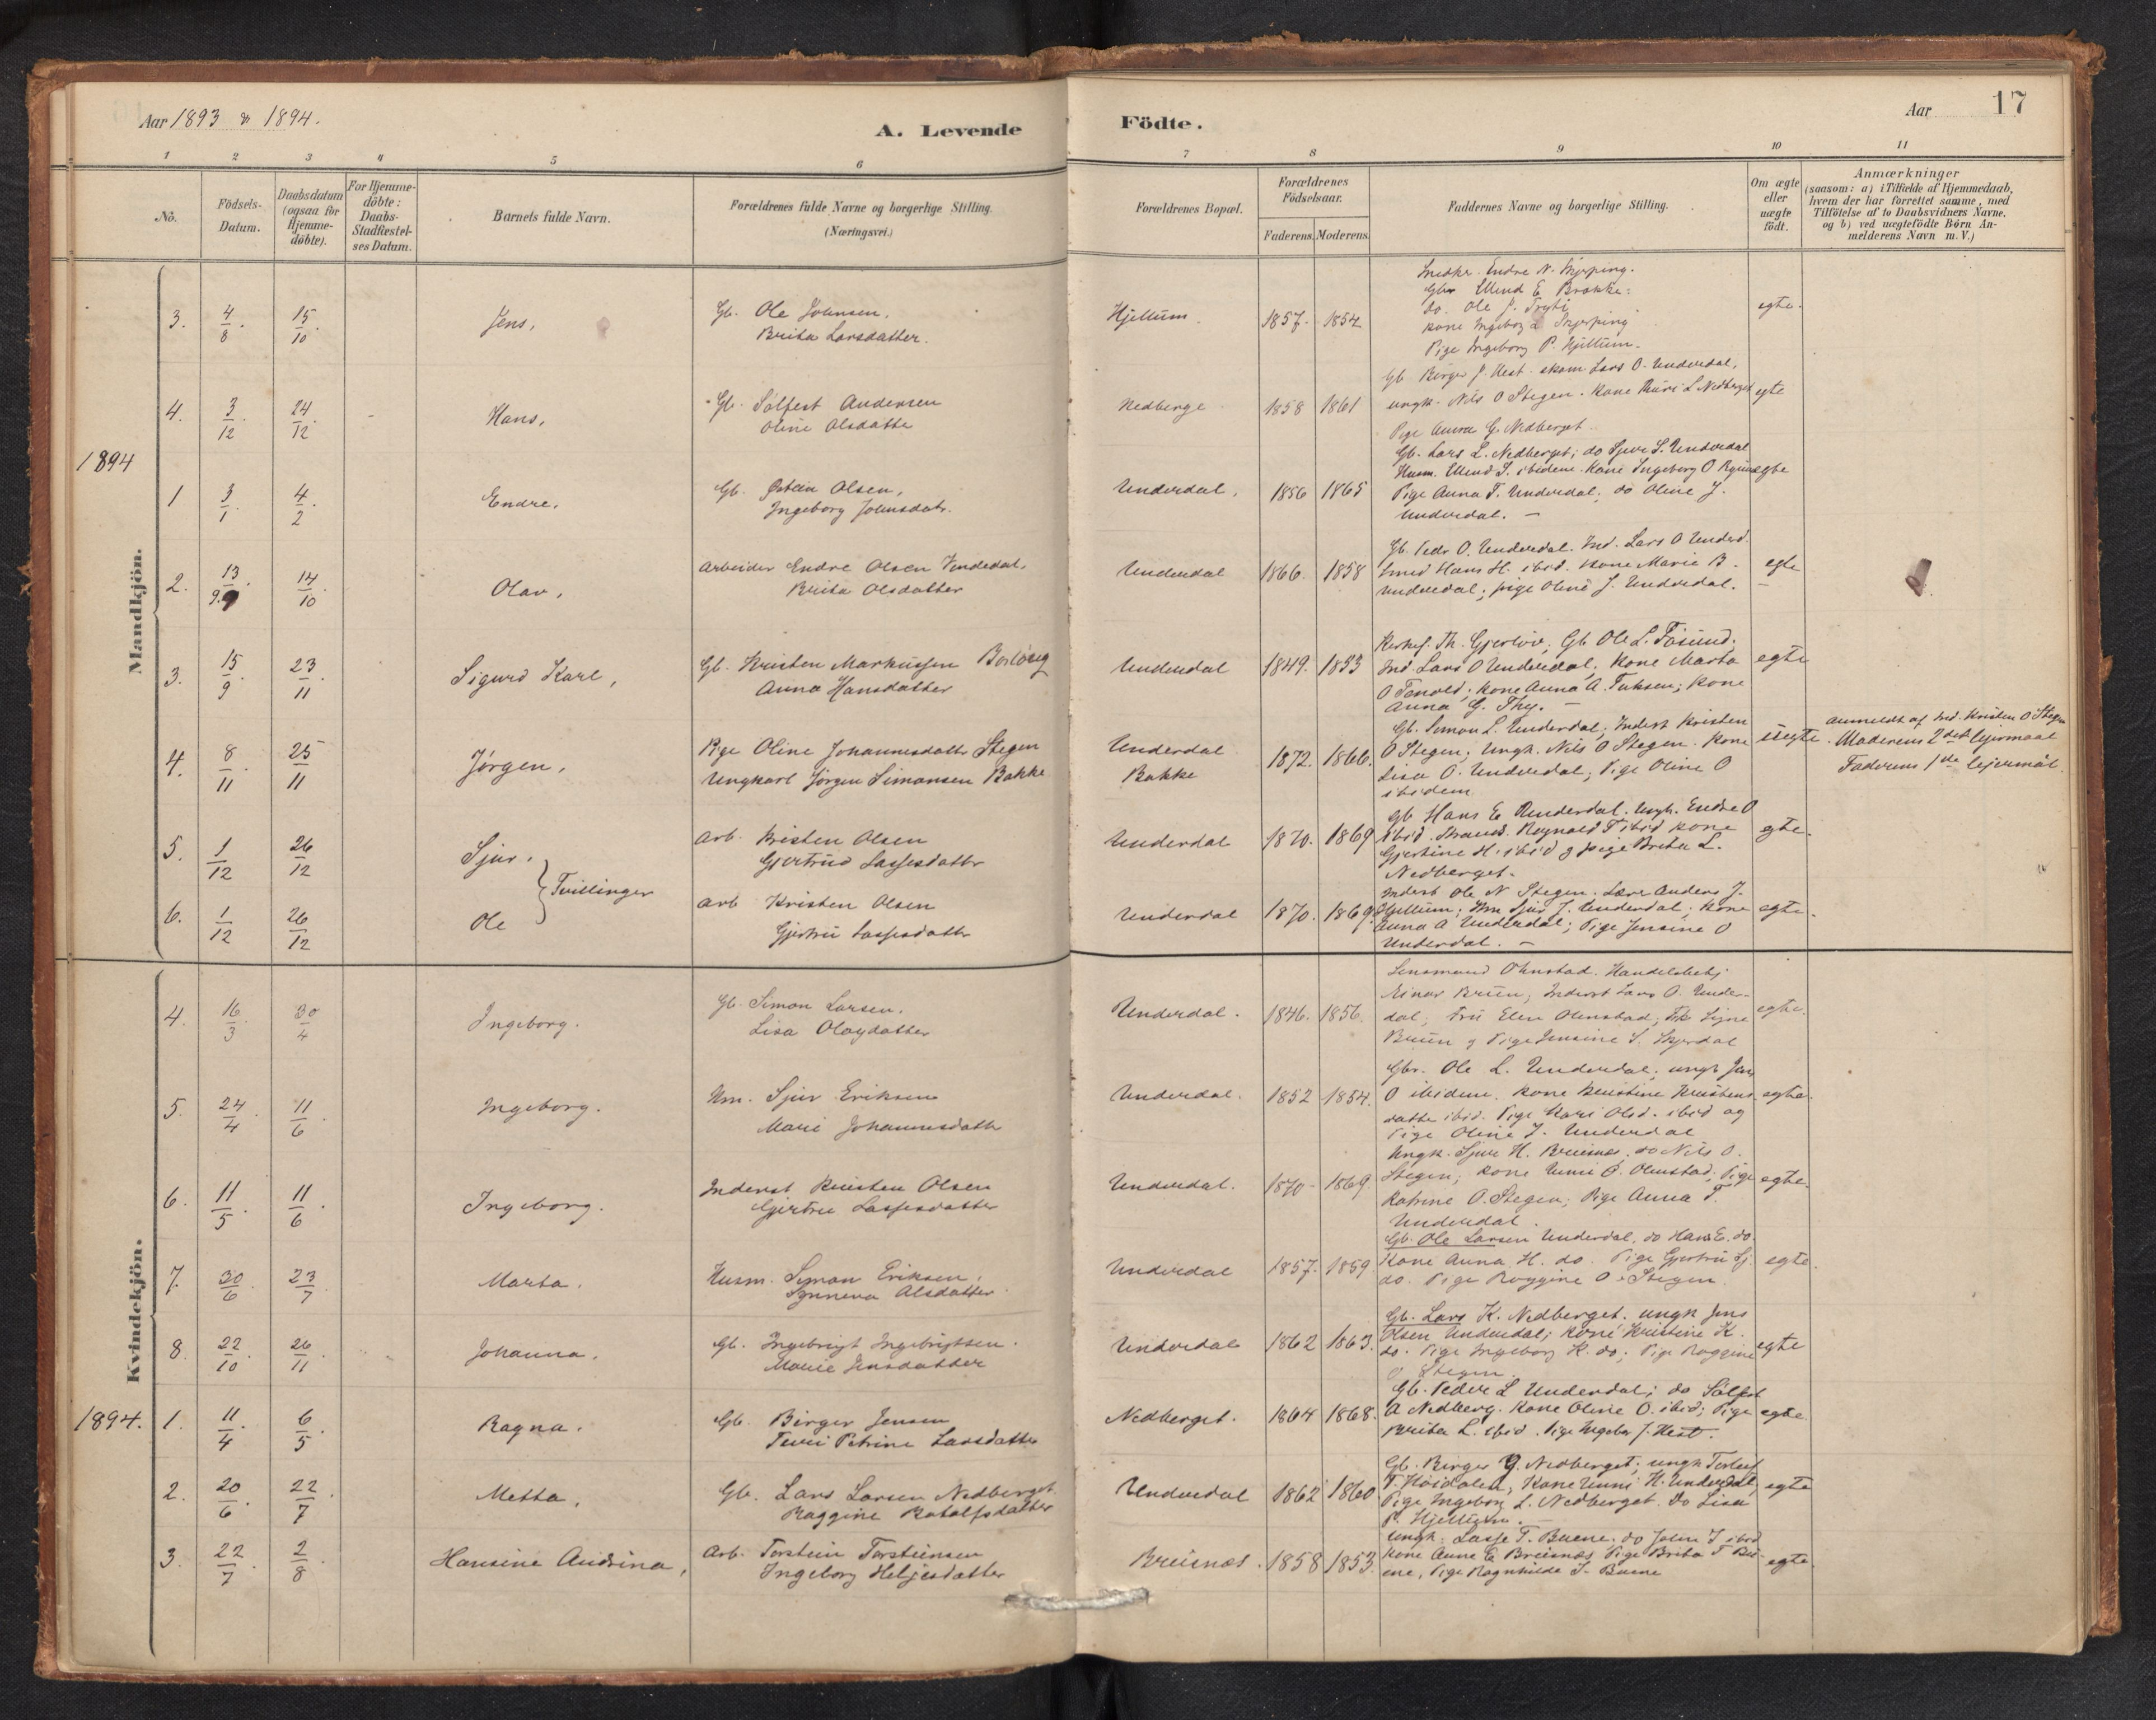 SAB, Aurland sokneprestembete, H/Ha/Hae/L0001: Ministerialbok nr. E 1, 1880-1907, s. 16b-17a